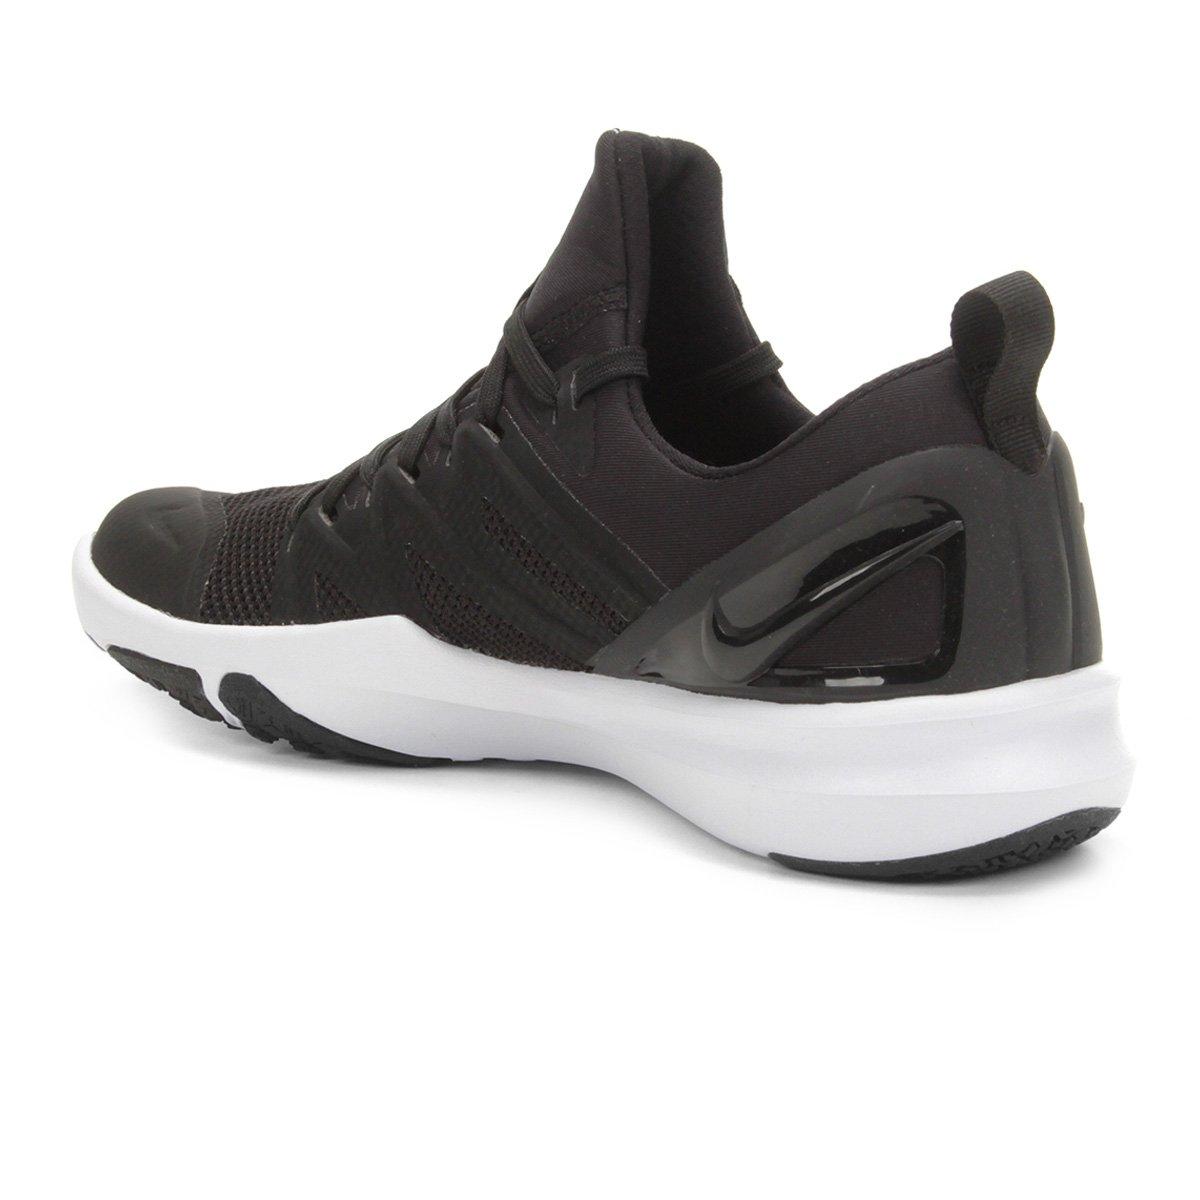 bdf9345ce33 Tênis Nike Victory Elite Trainer Masculino